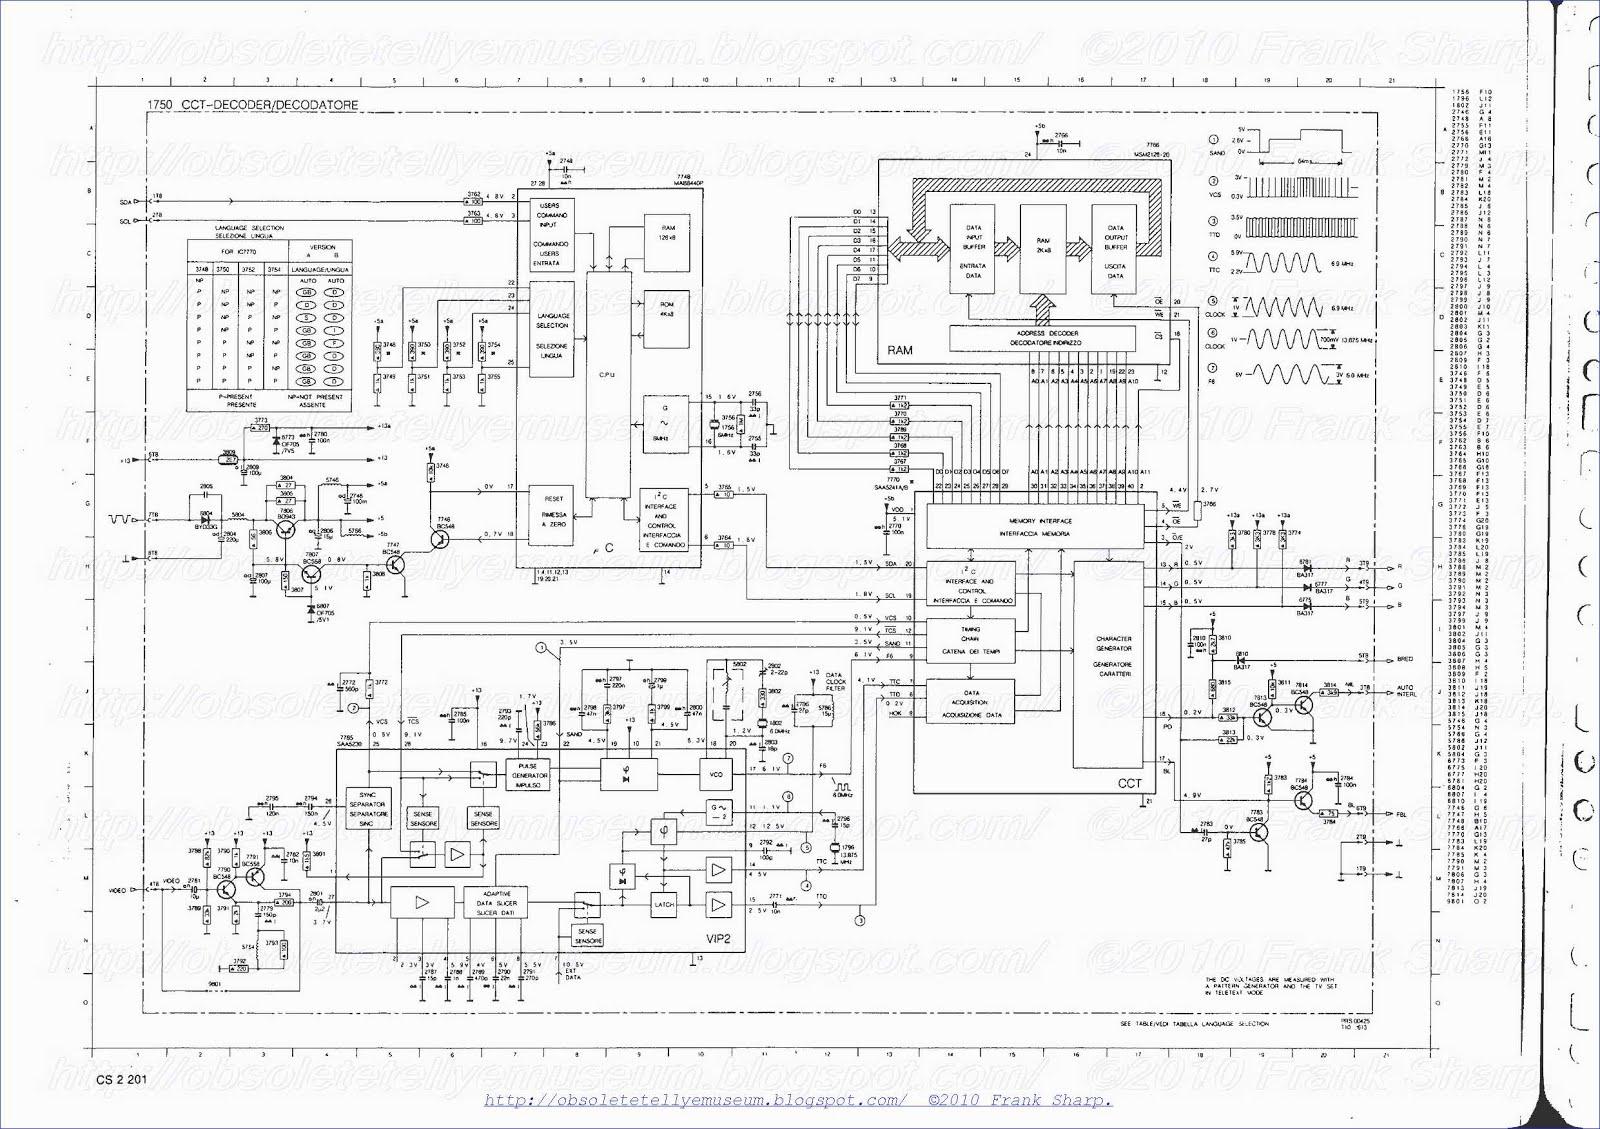 Lt2000 Superwinch Wiring Diagram Smart Diagrams Efcaviation Com 2500 Lb Badland Winch